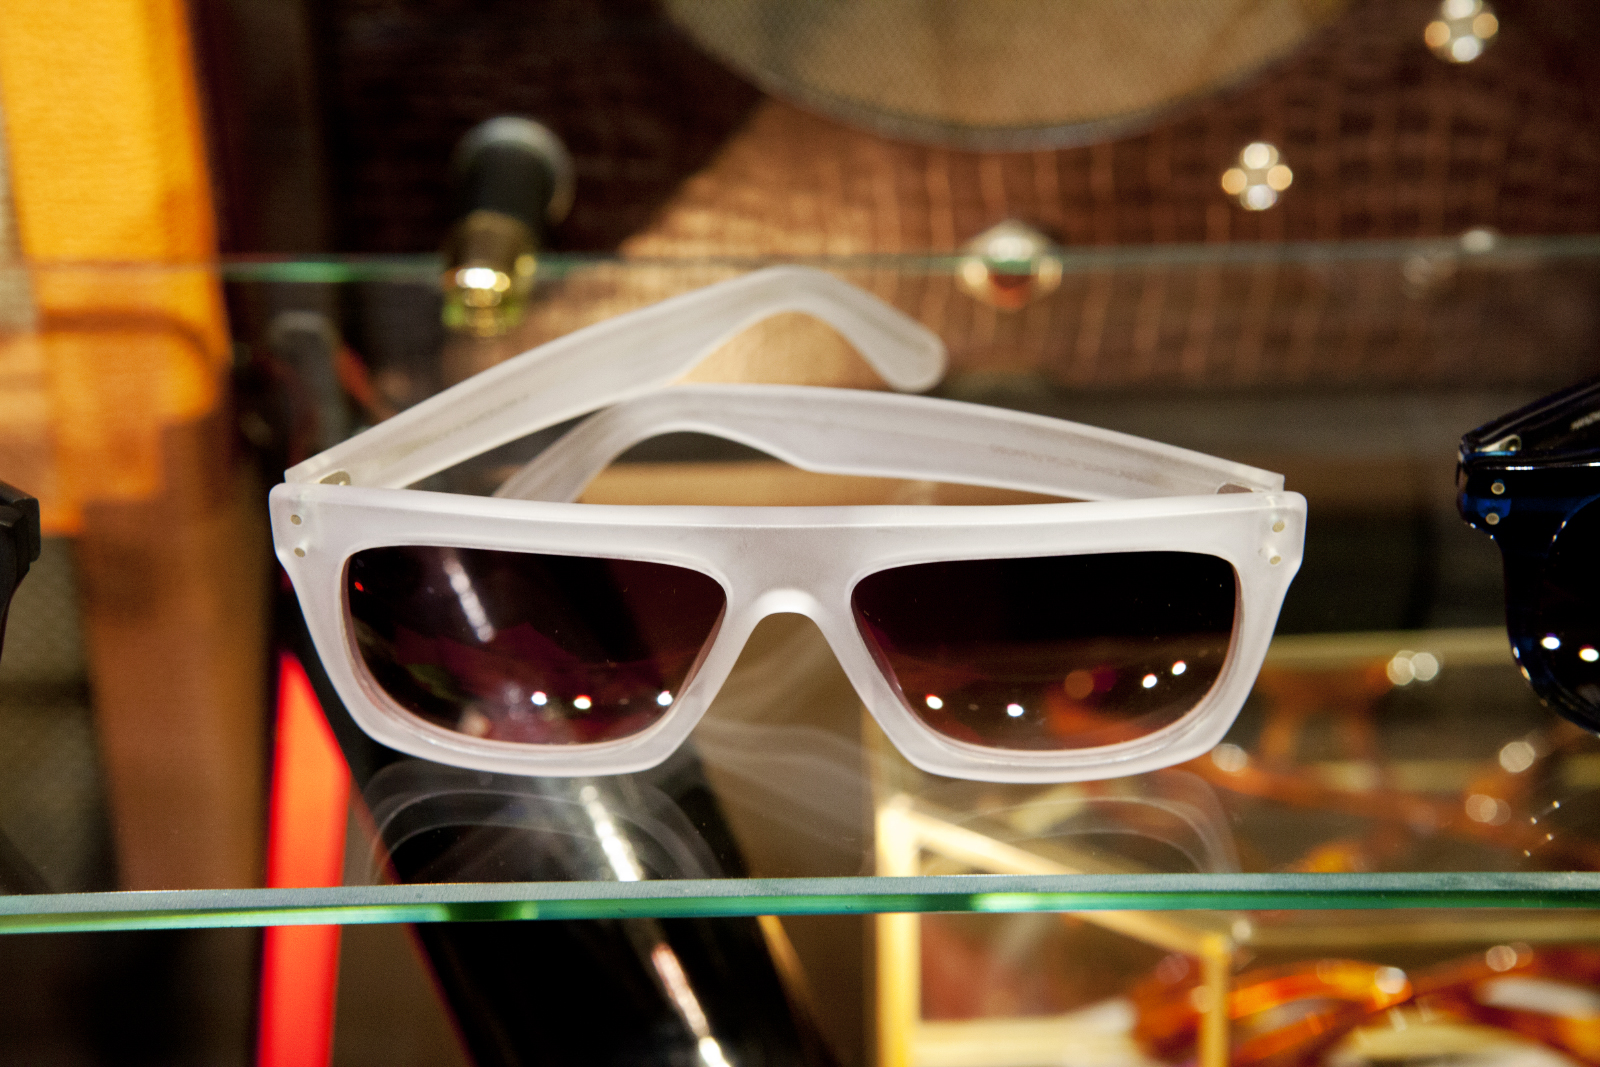 Robert_Adalierd_Rob_Design_Furniture_Wilde_sunglasses3.jpg